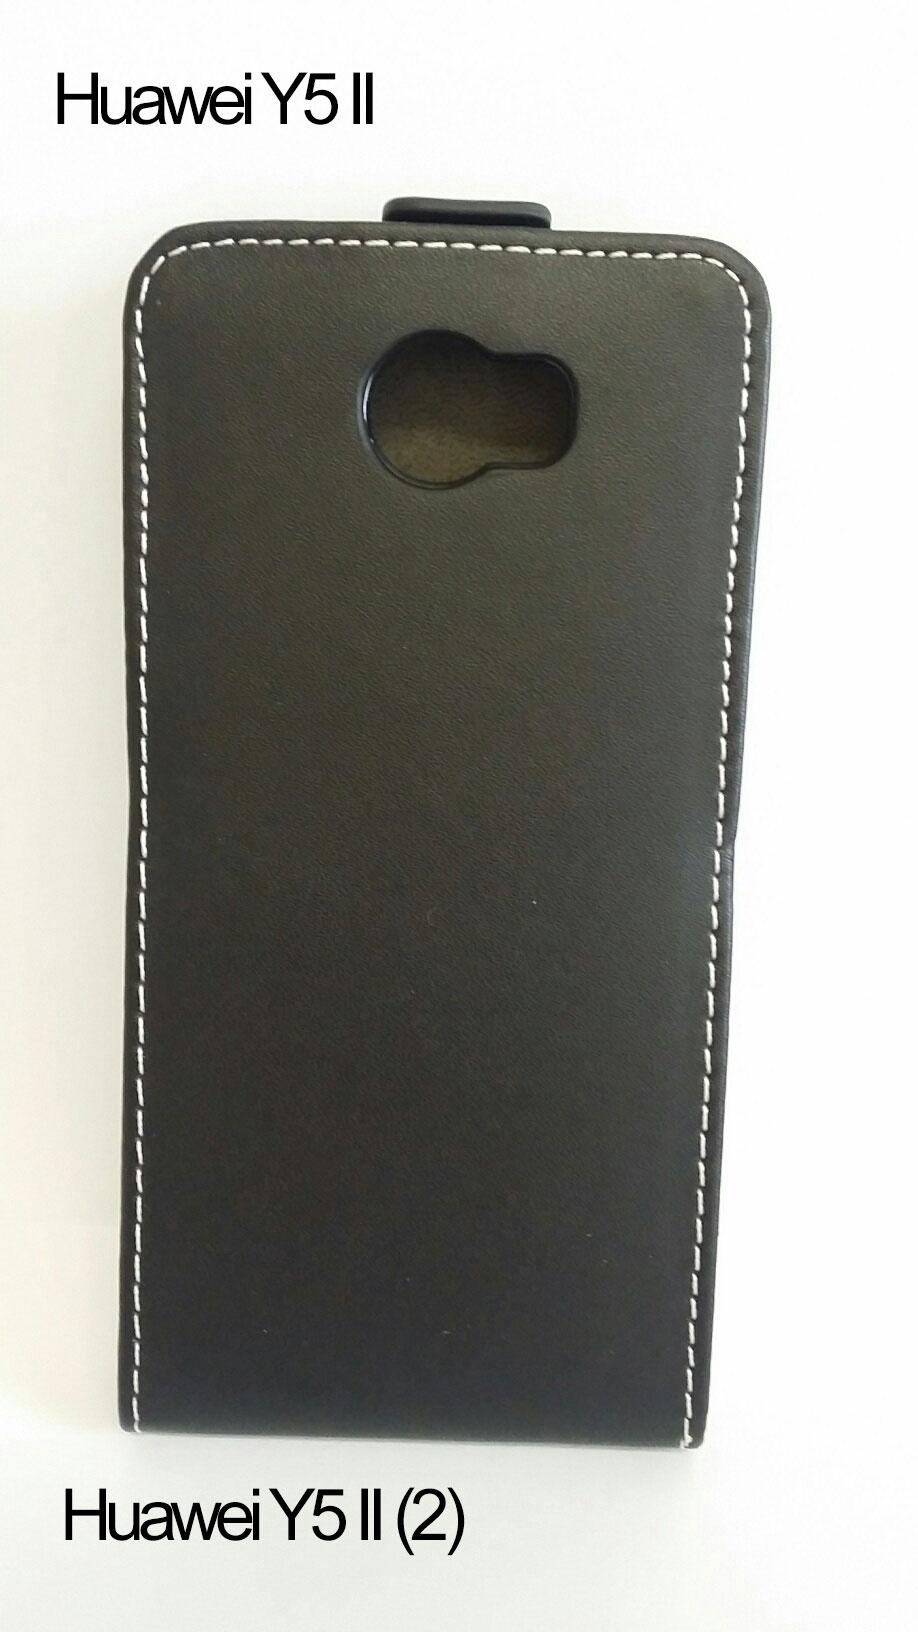 Forcell flipové pouzdro na mobil Huawei Y5 II   Y6 II Compact černá barva  empty e08cc931bc1